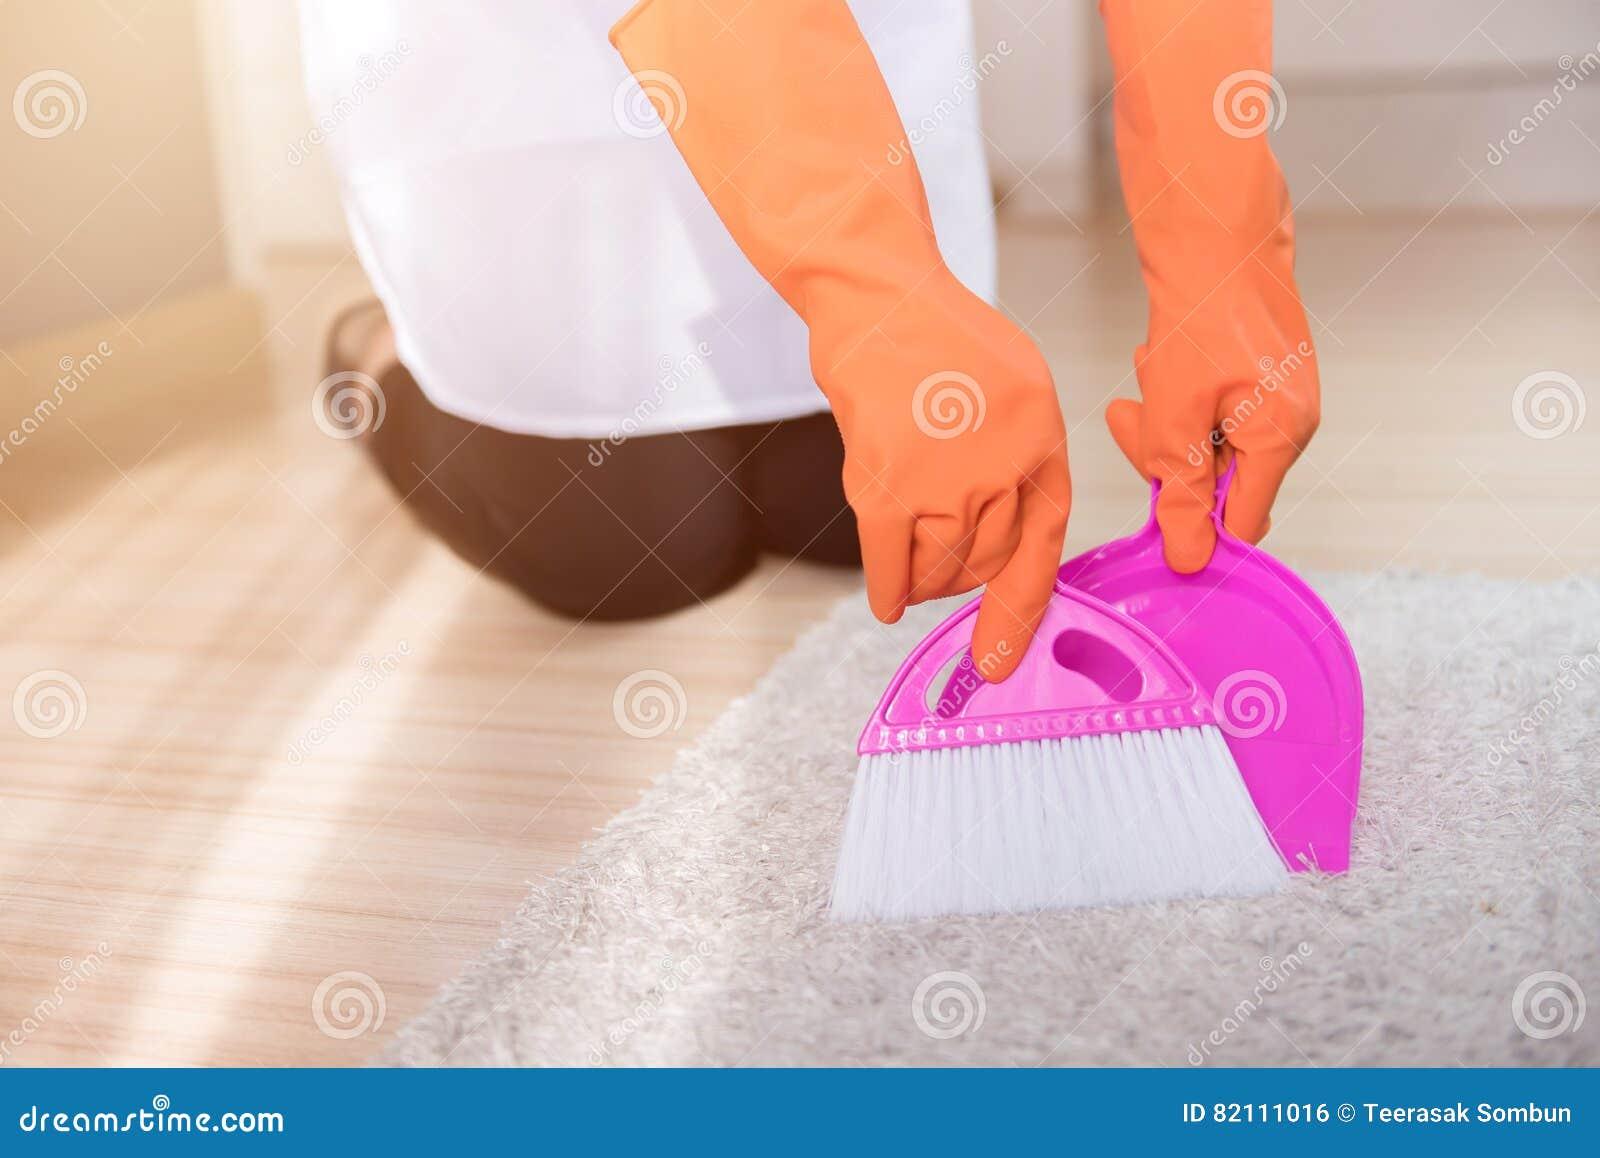 Cleaning Sr Carpet By Hand Carpet Vidalondon